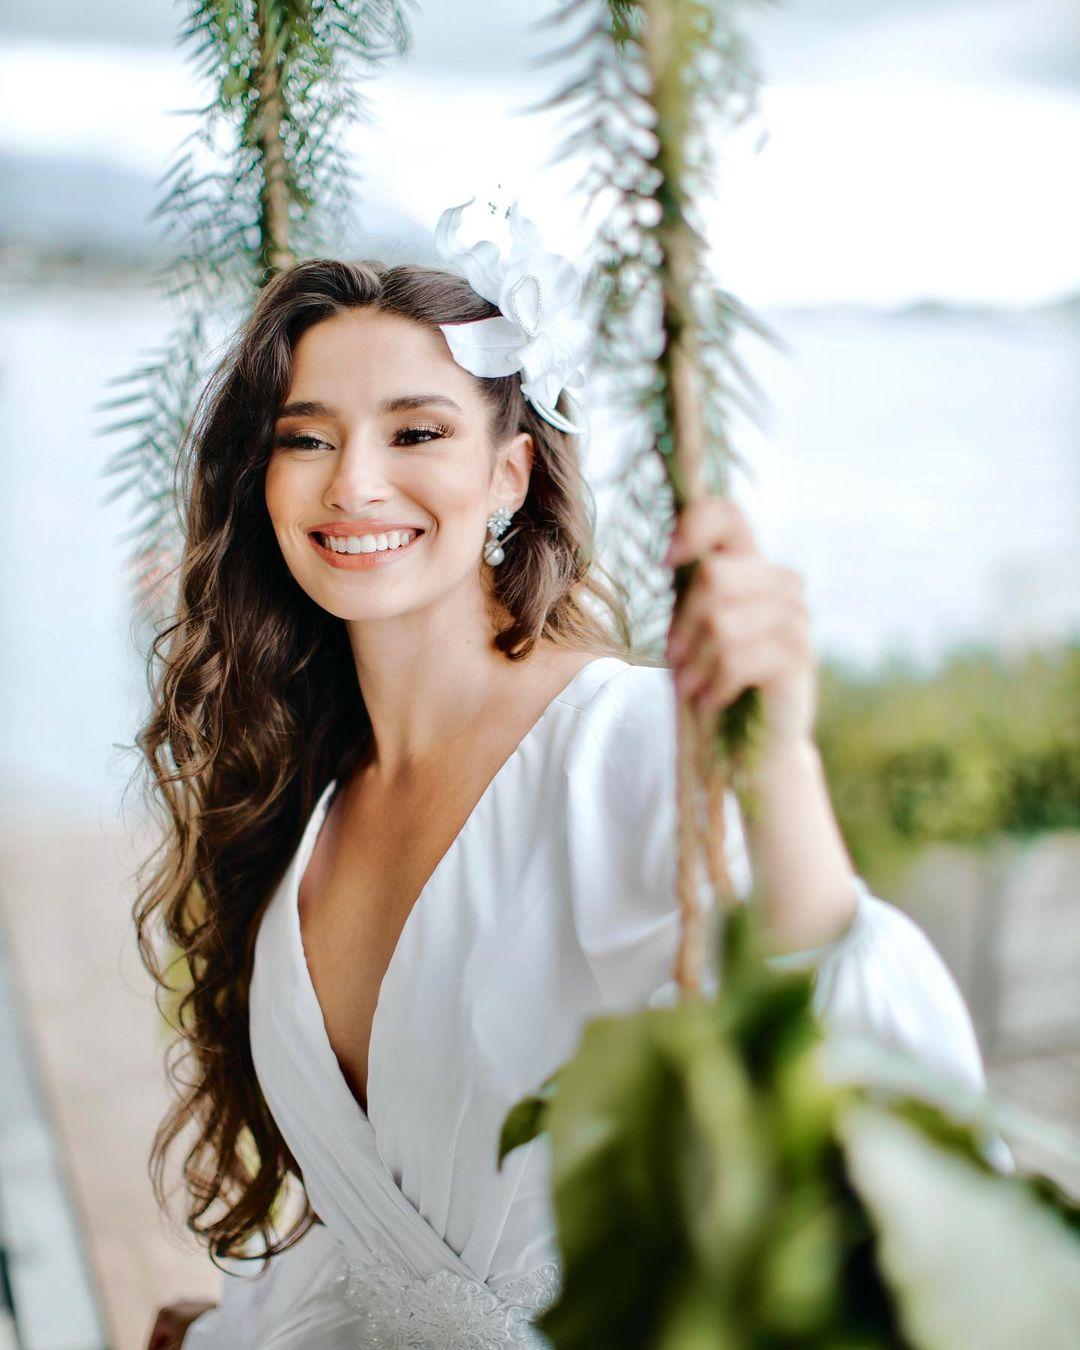 luma russo, top 3 de miss supranational brazil 2020. - Página 3 Russol18